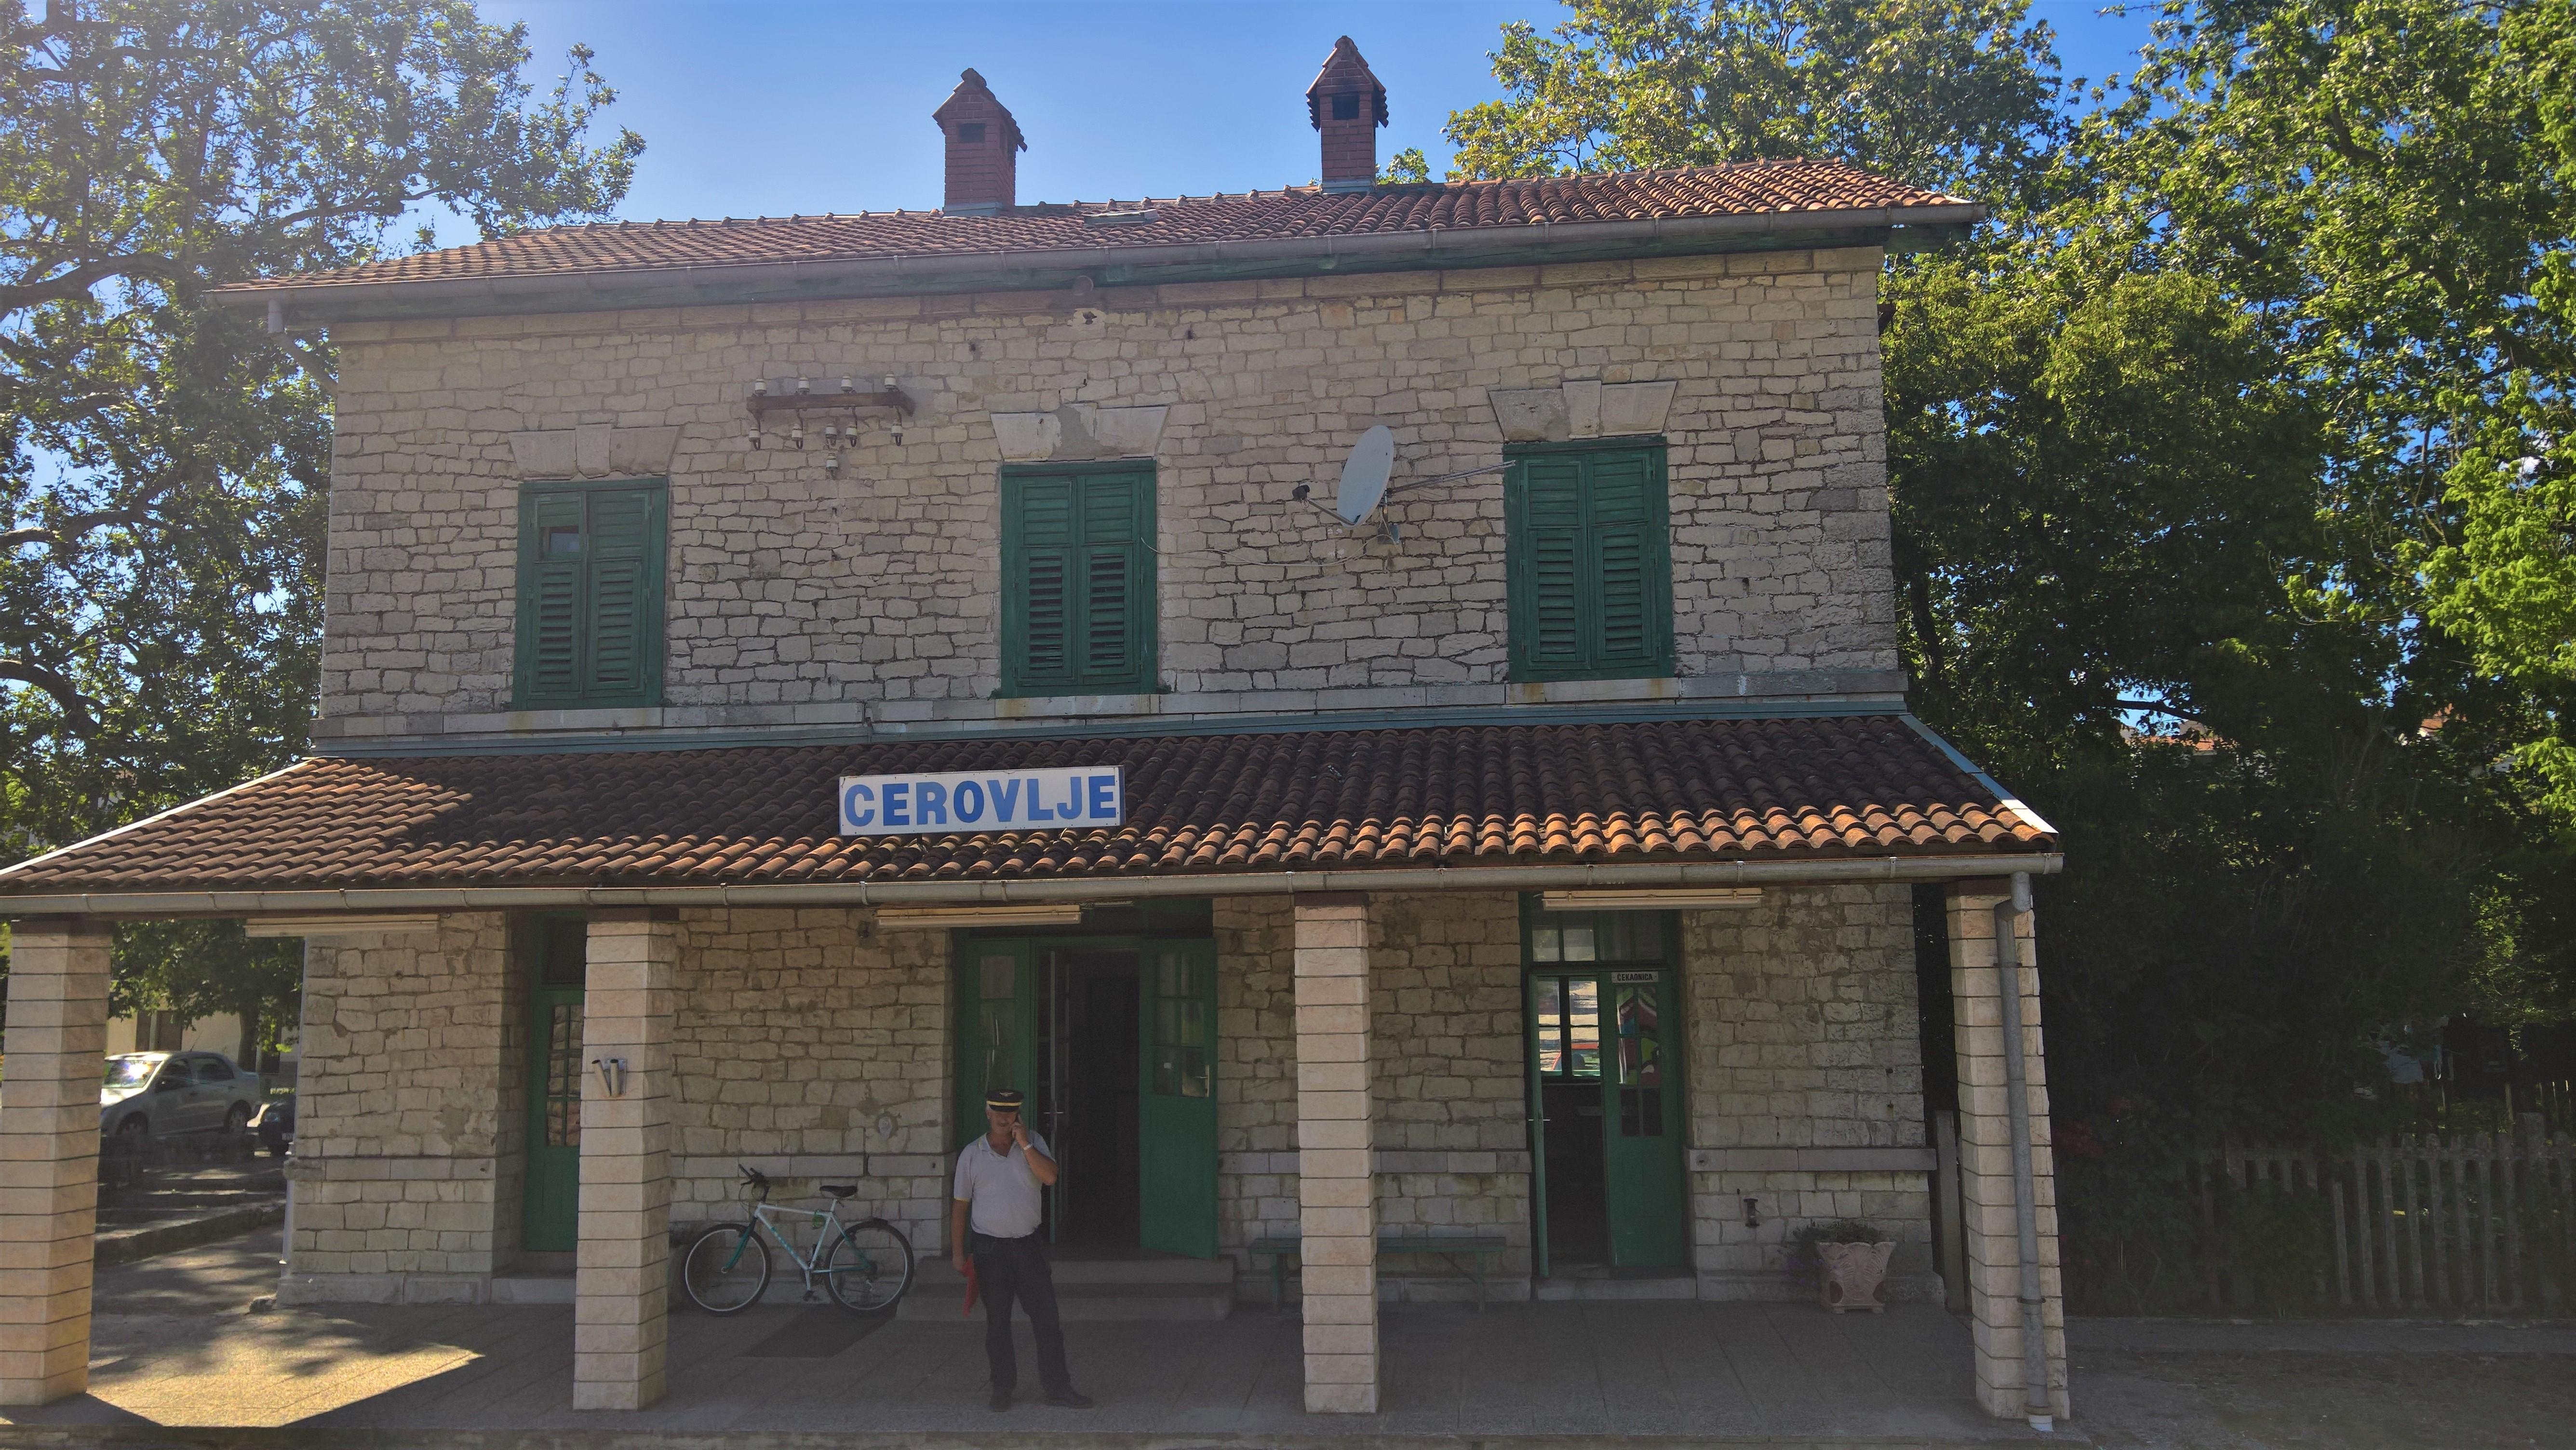 Istrian railway - Istriago.net